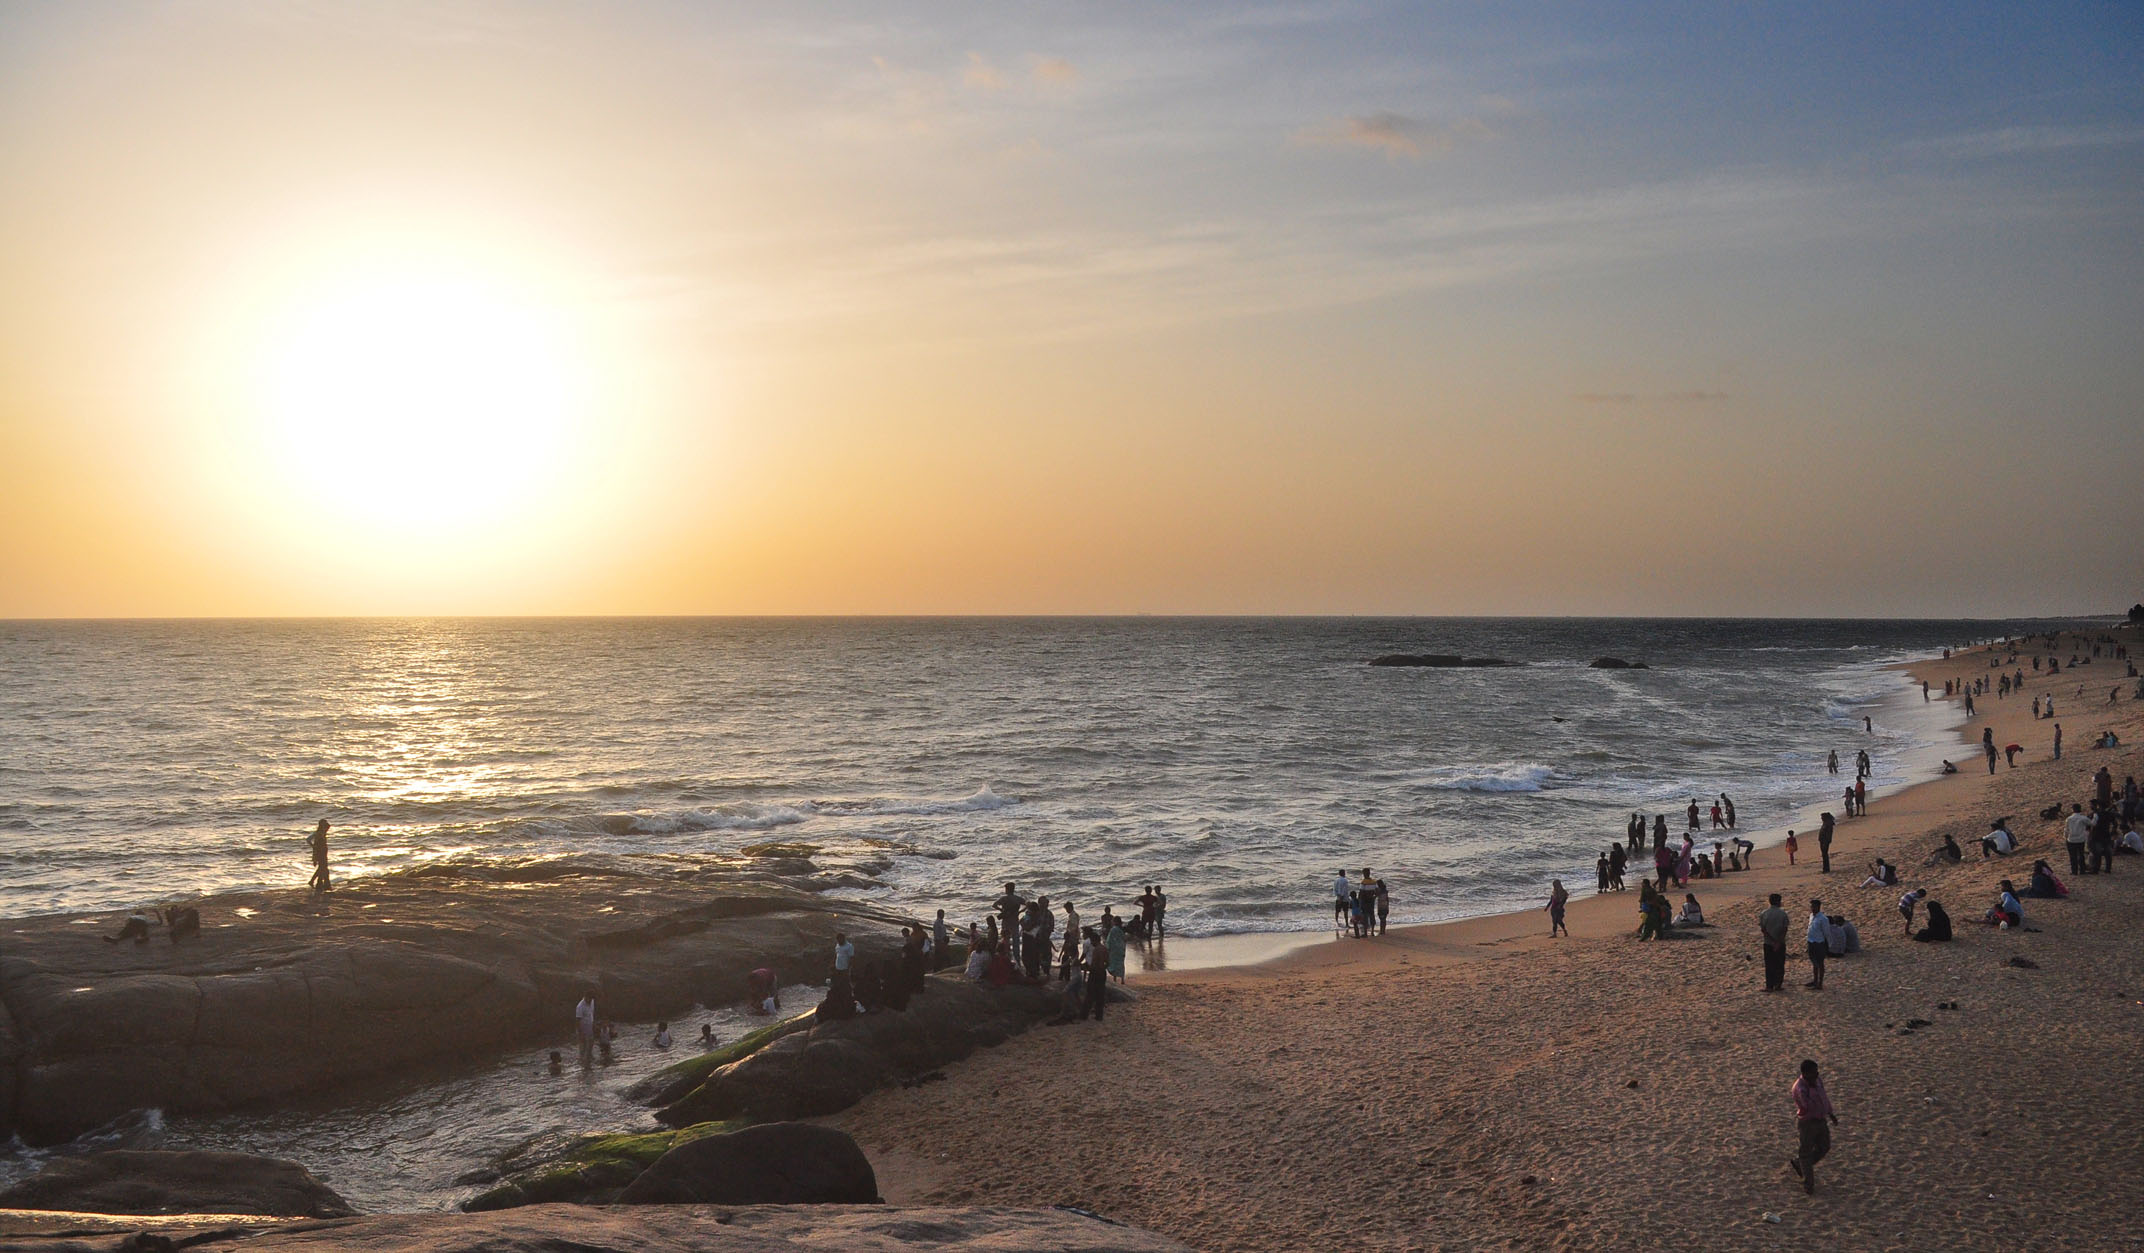 Someshwar Beach - Mangalore Image